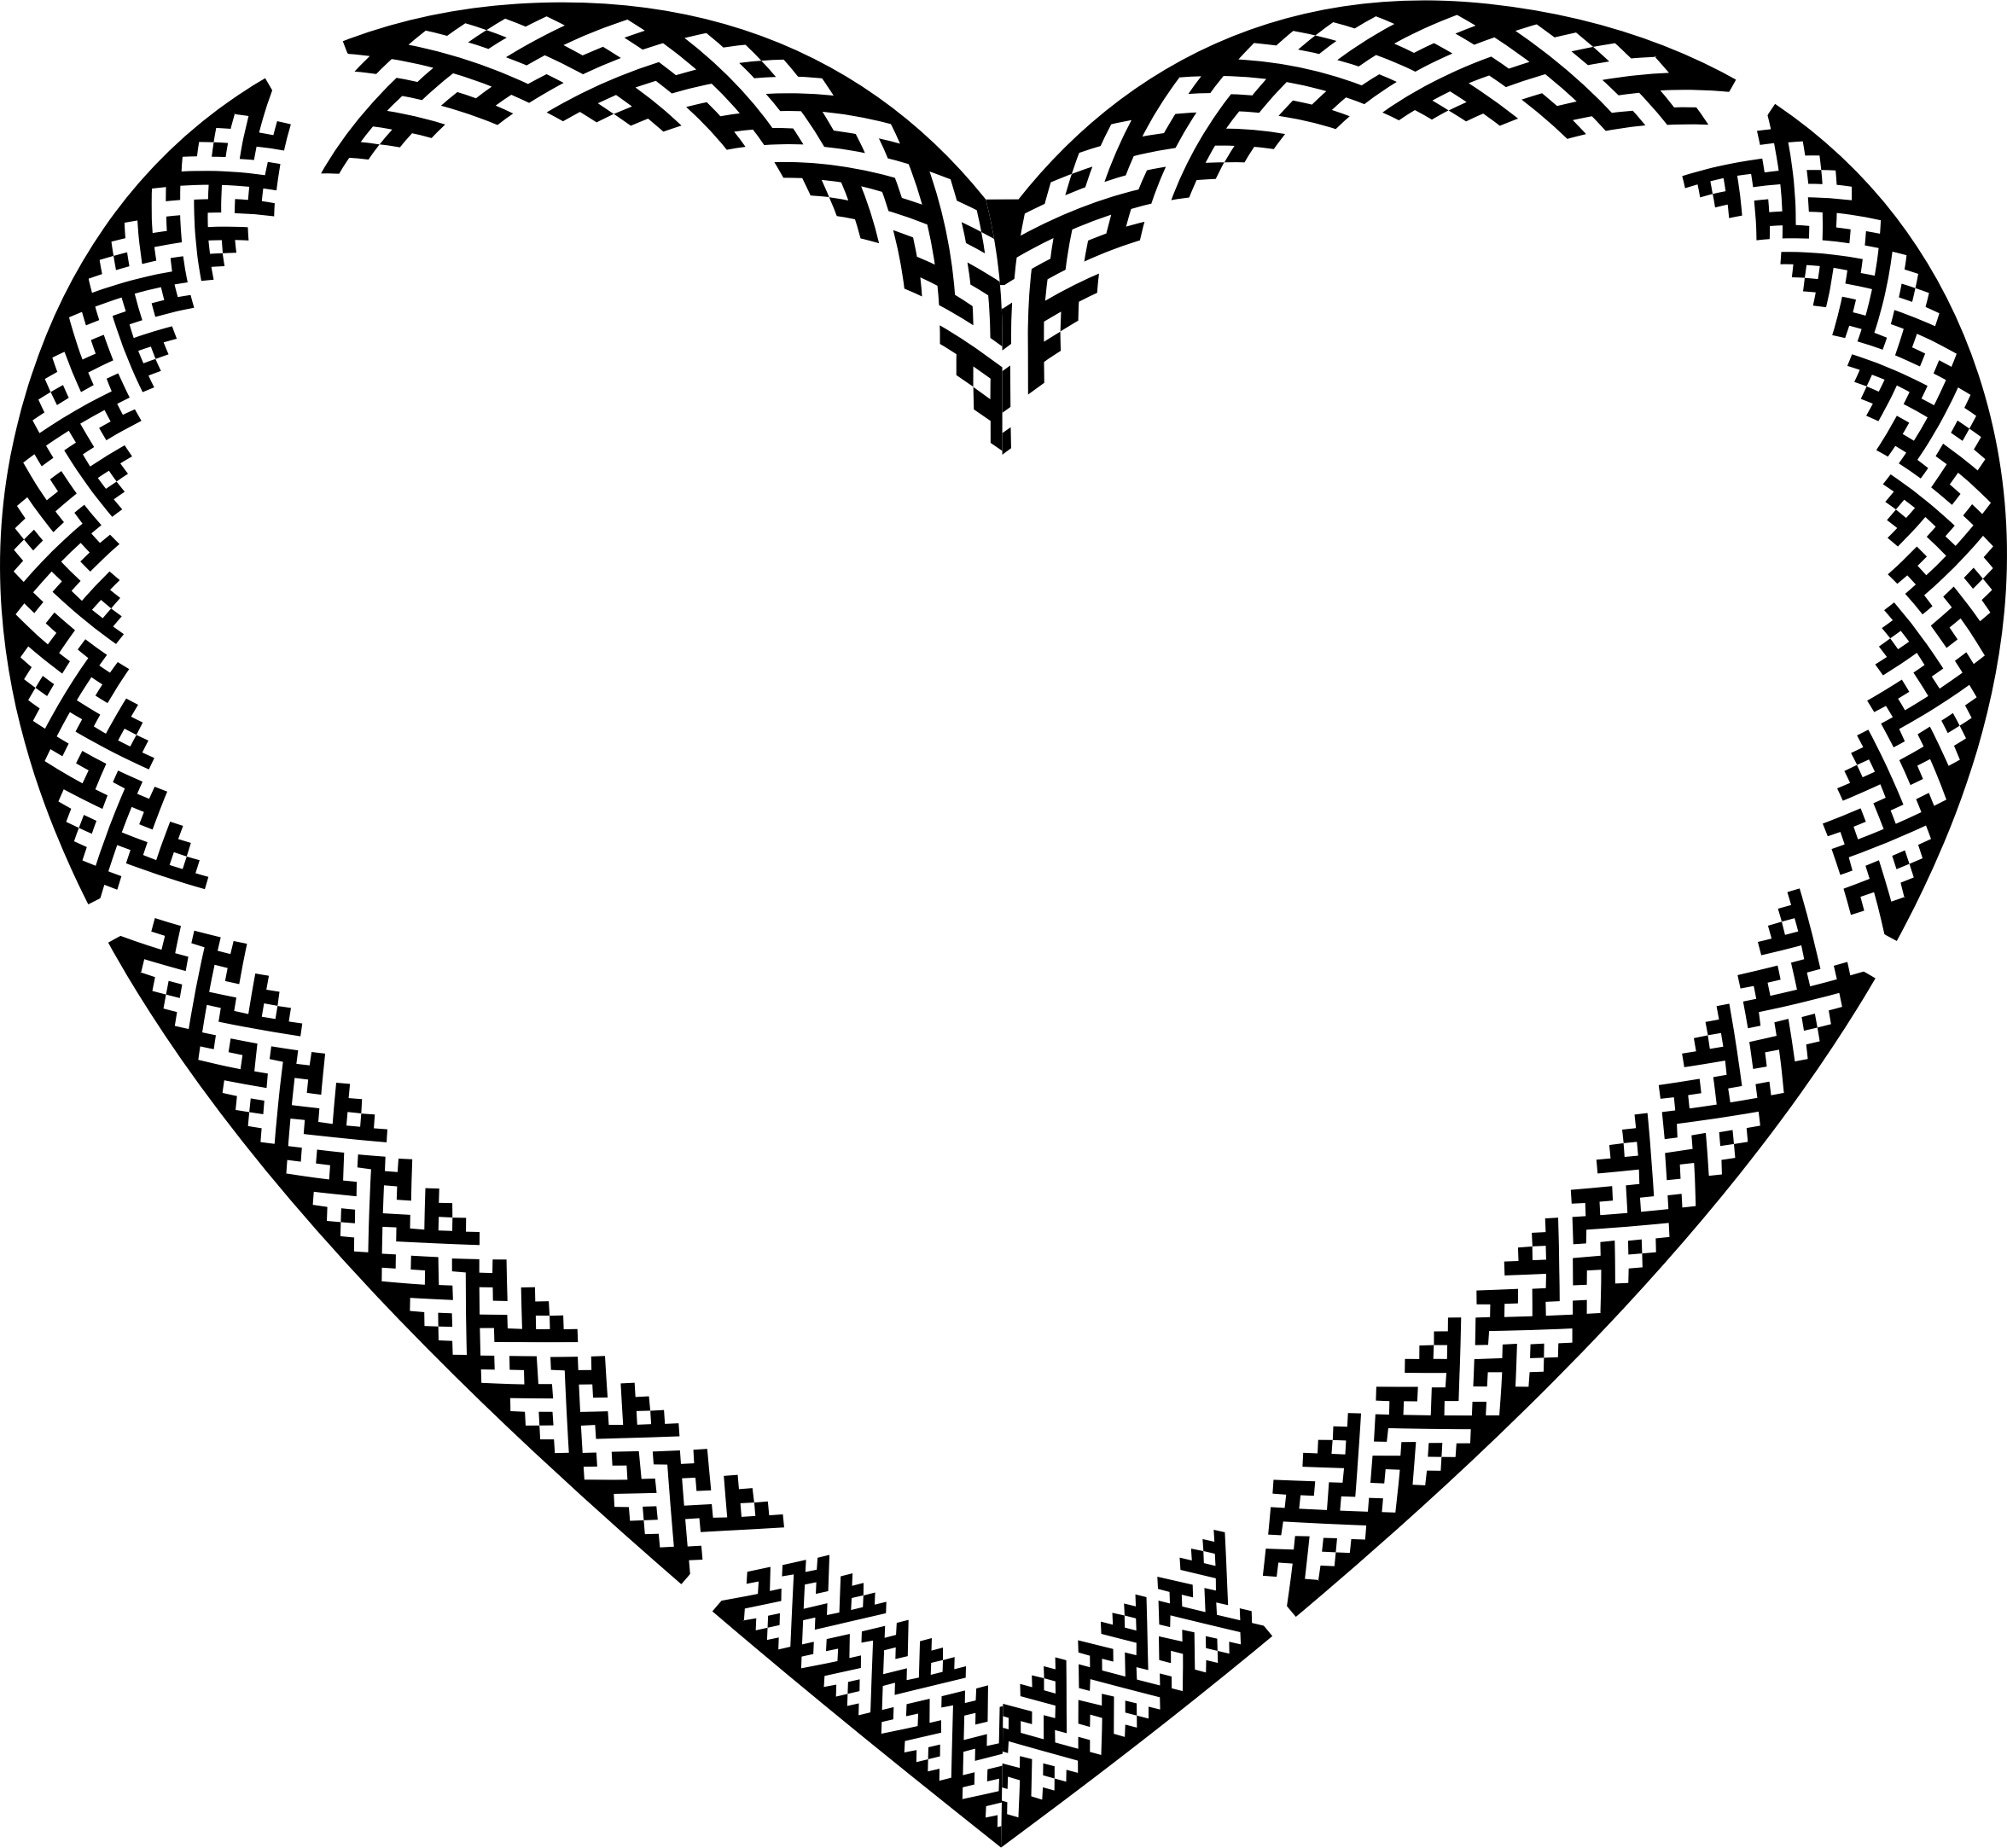 2352x2166 Clipart